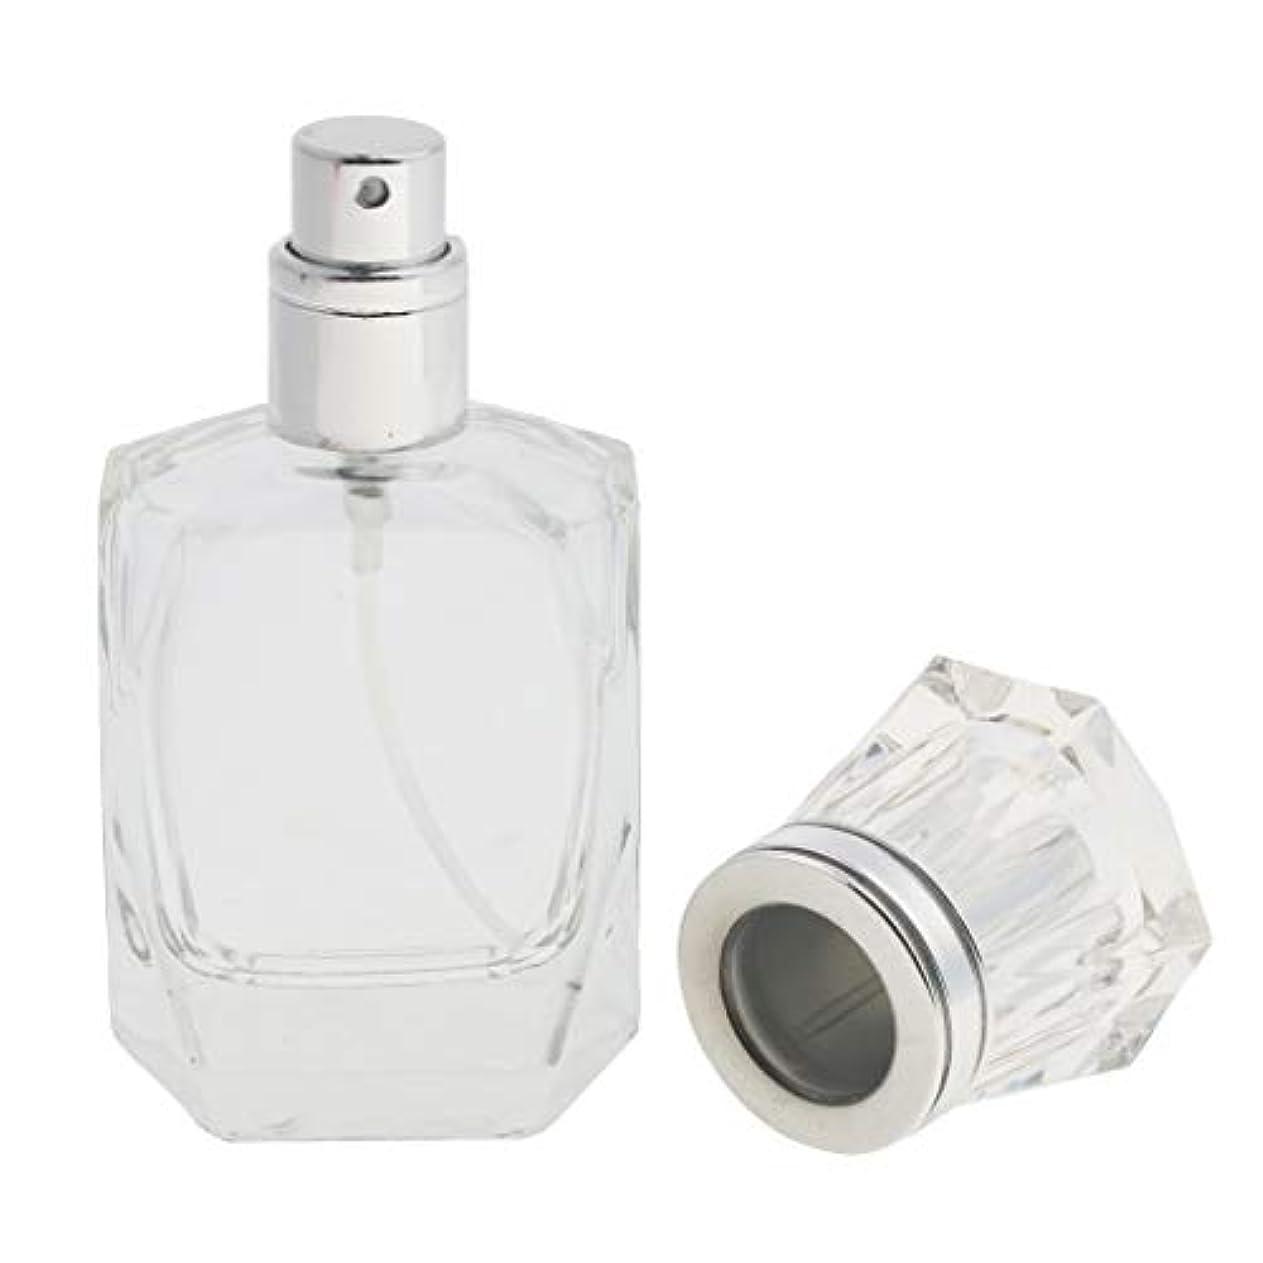 CUTICATE 香水ボトル 化粧ボトル ガラス ミストボトル 30ml クリア 旅行小物